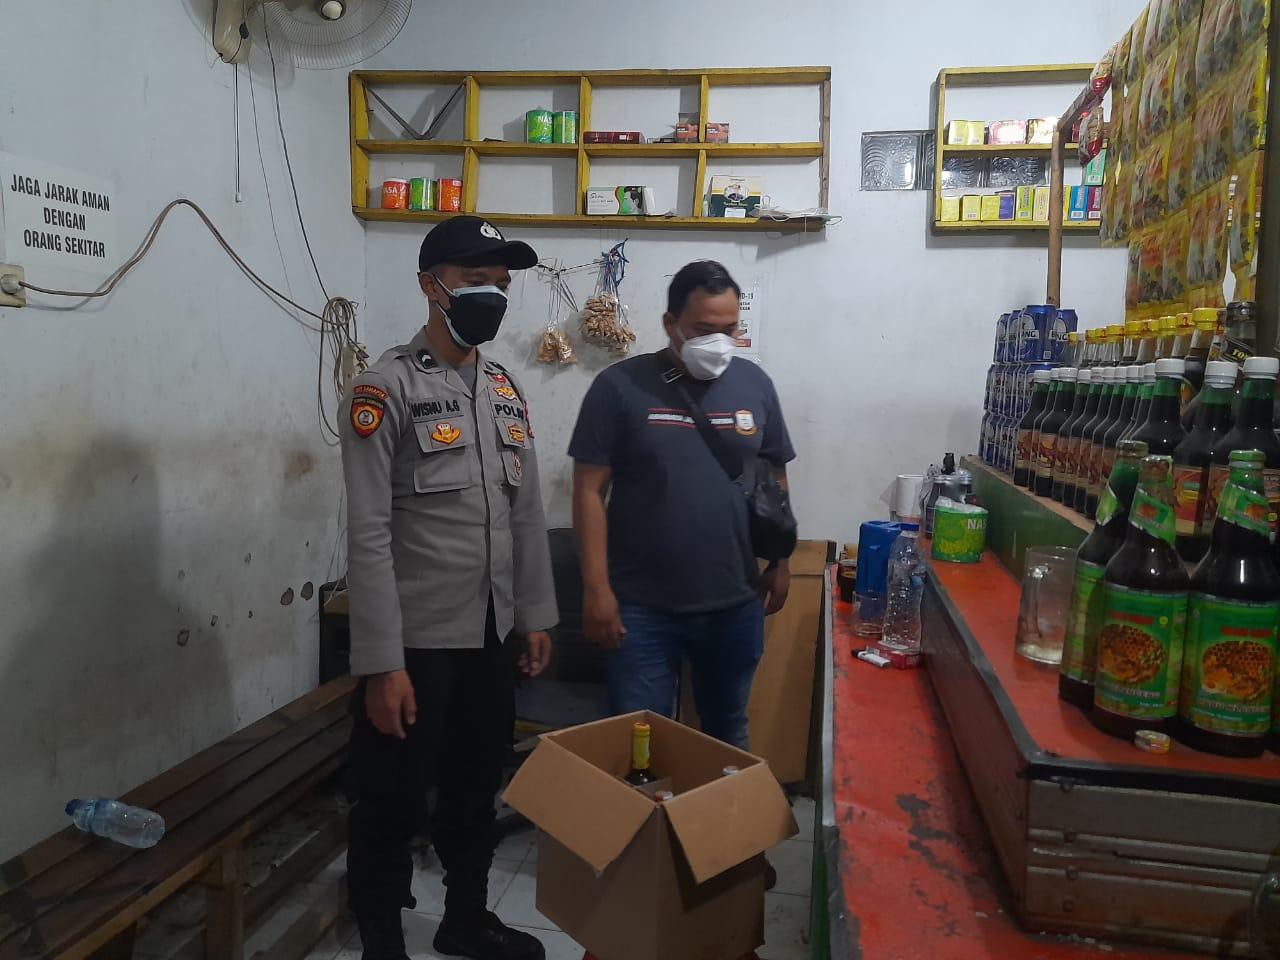 Gambar Berkedok Kios Jamu, Polsek Serang Polres Serang Kota Temukan 106 Botol Miras 3